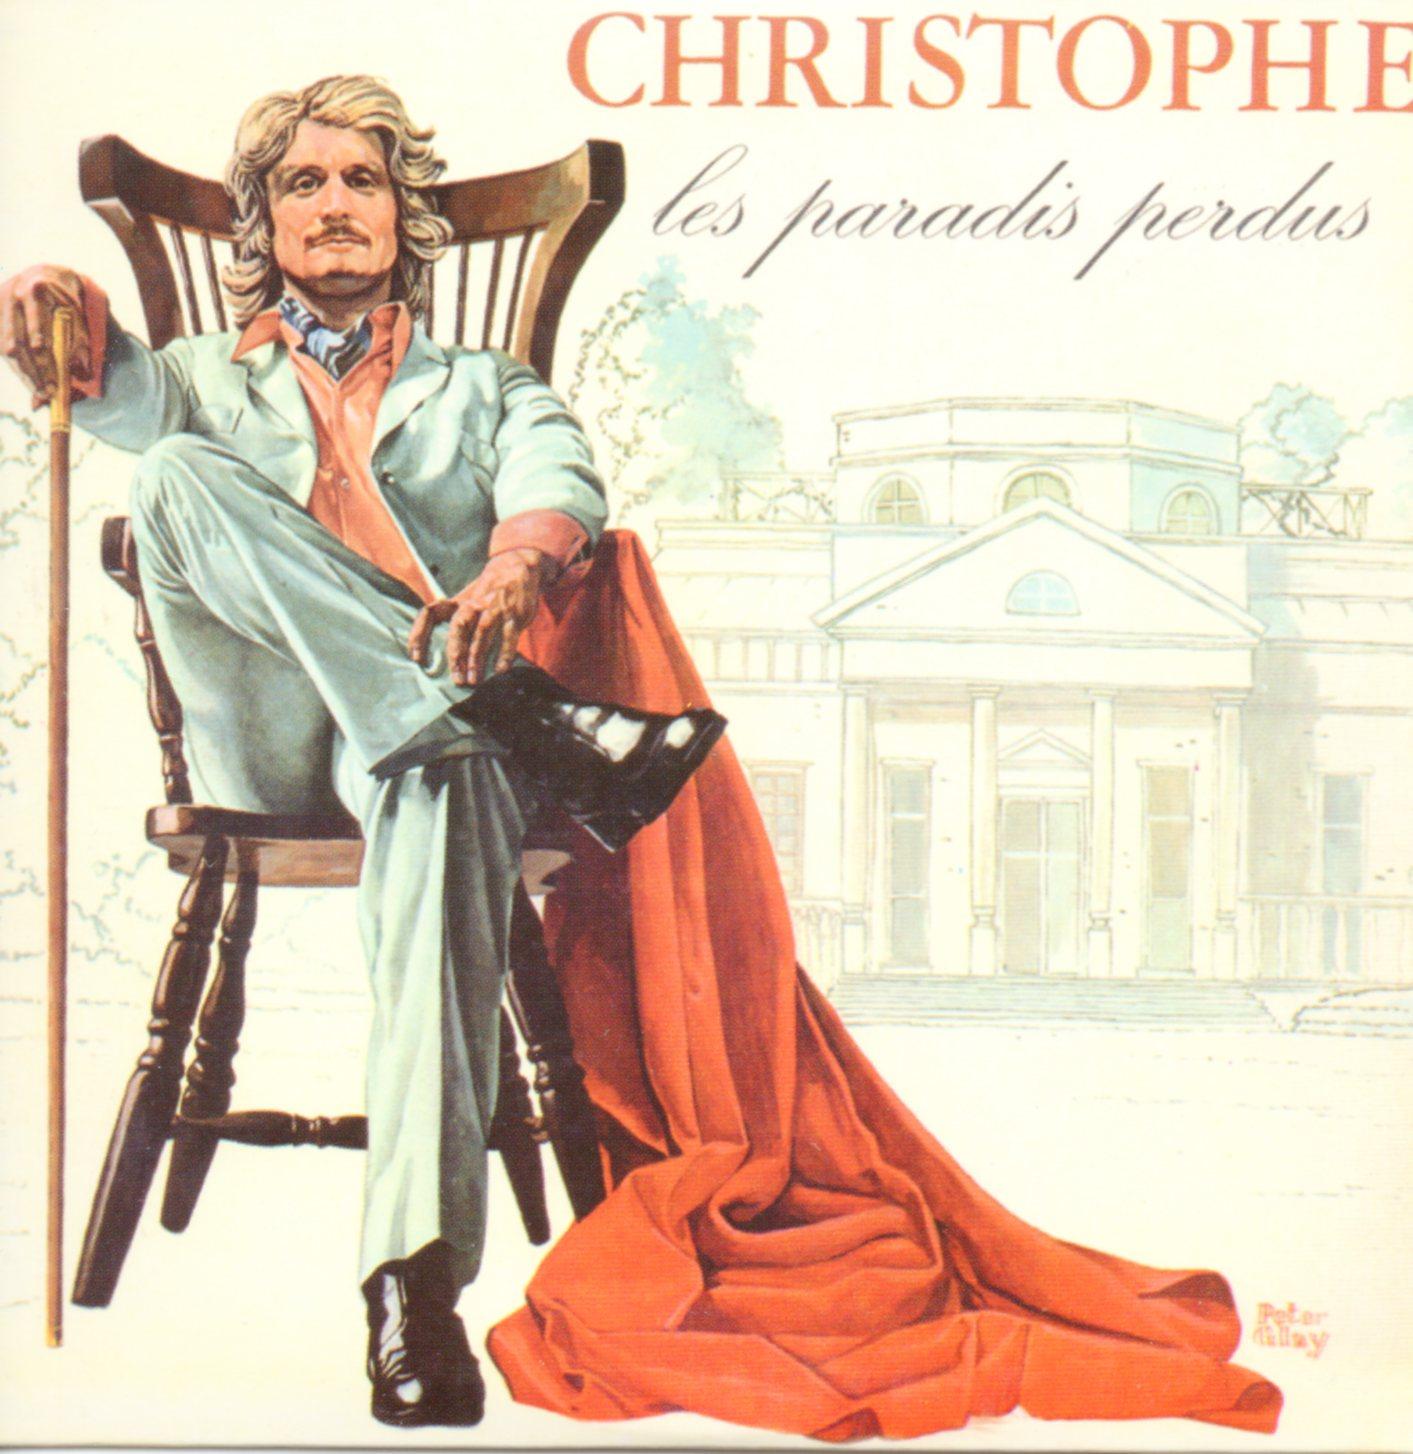 CHRISTOPHE - JEAN-MICHEL JARRE - Les paradis perdus - Mini LP Replica CARD SLEEVE - 9-TRACK - CD